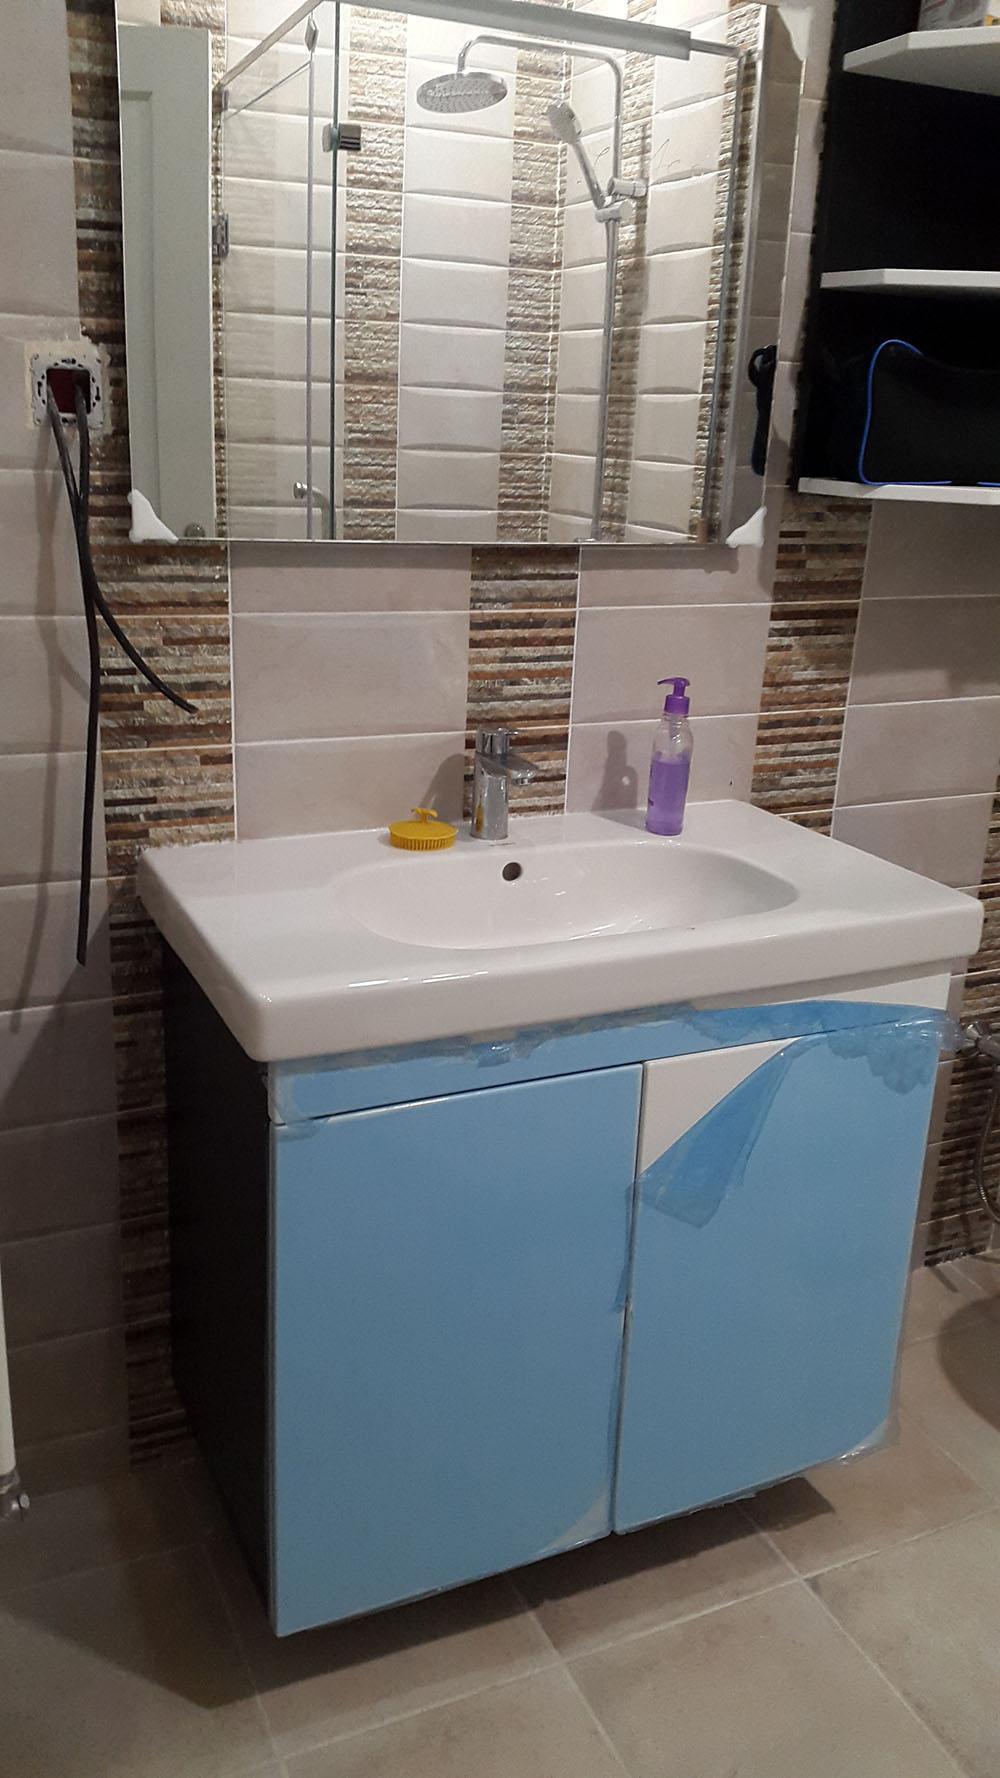 Colonne Salle De Bain Pas Cher Cdiscount ~ idir meubles salles de bain idir meubles